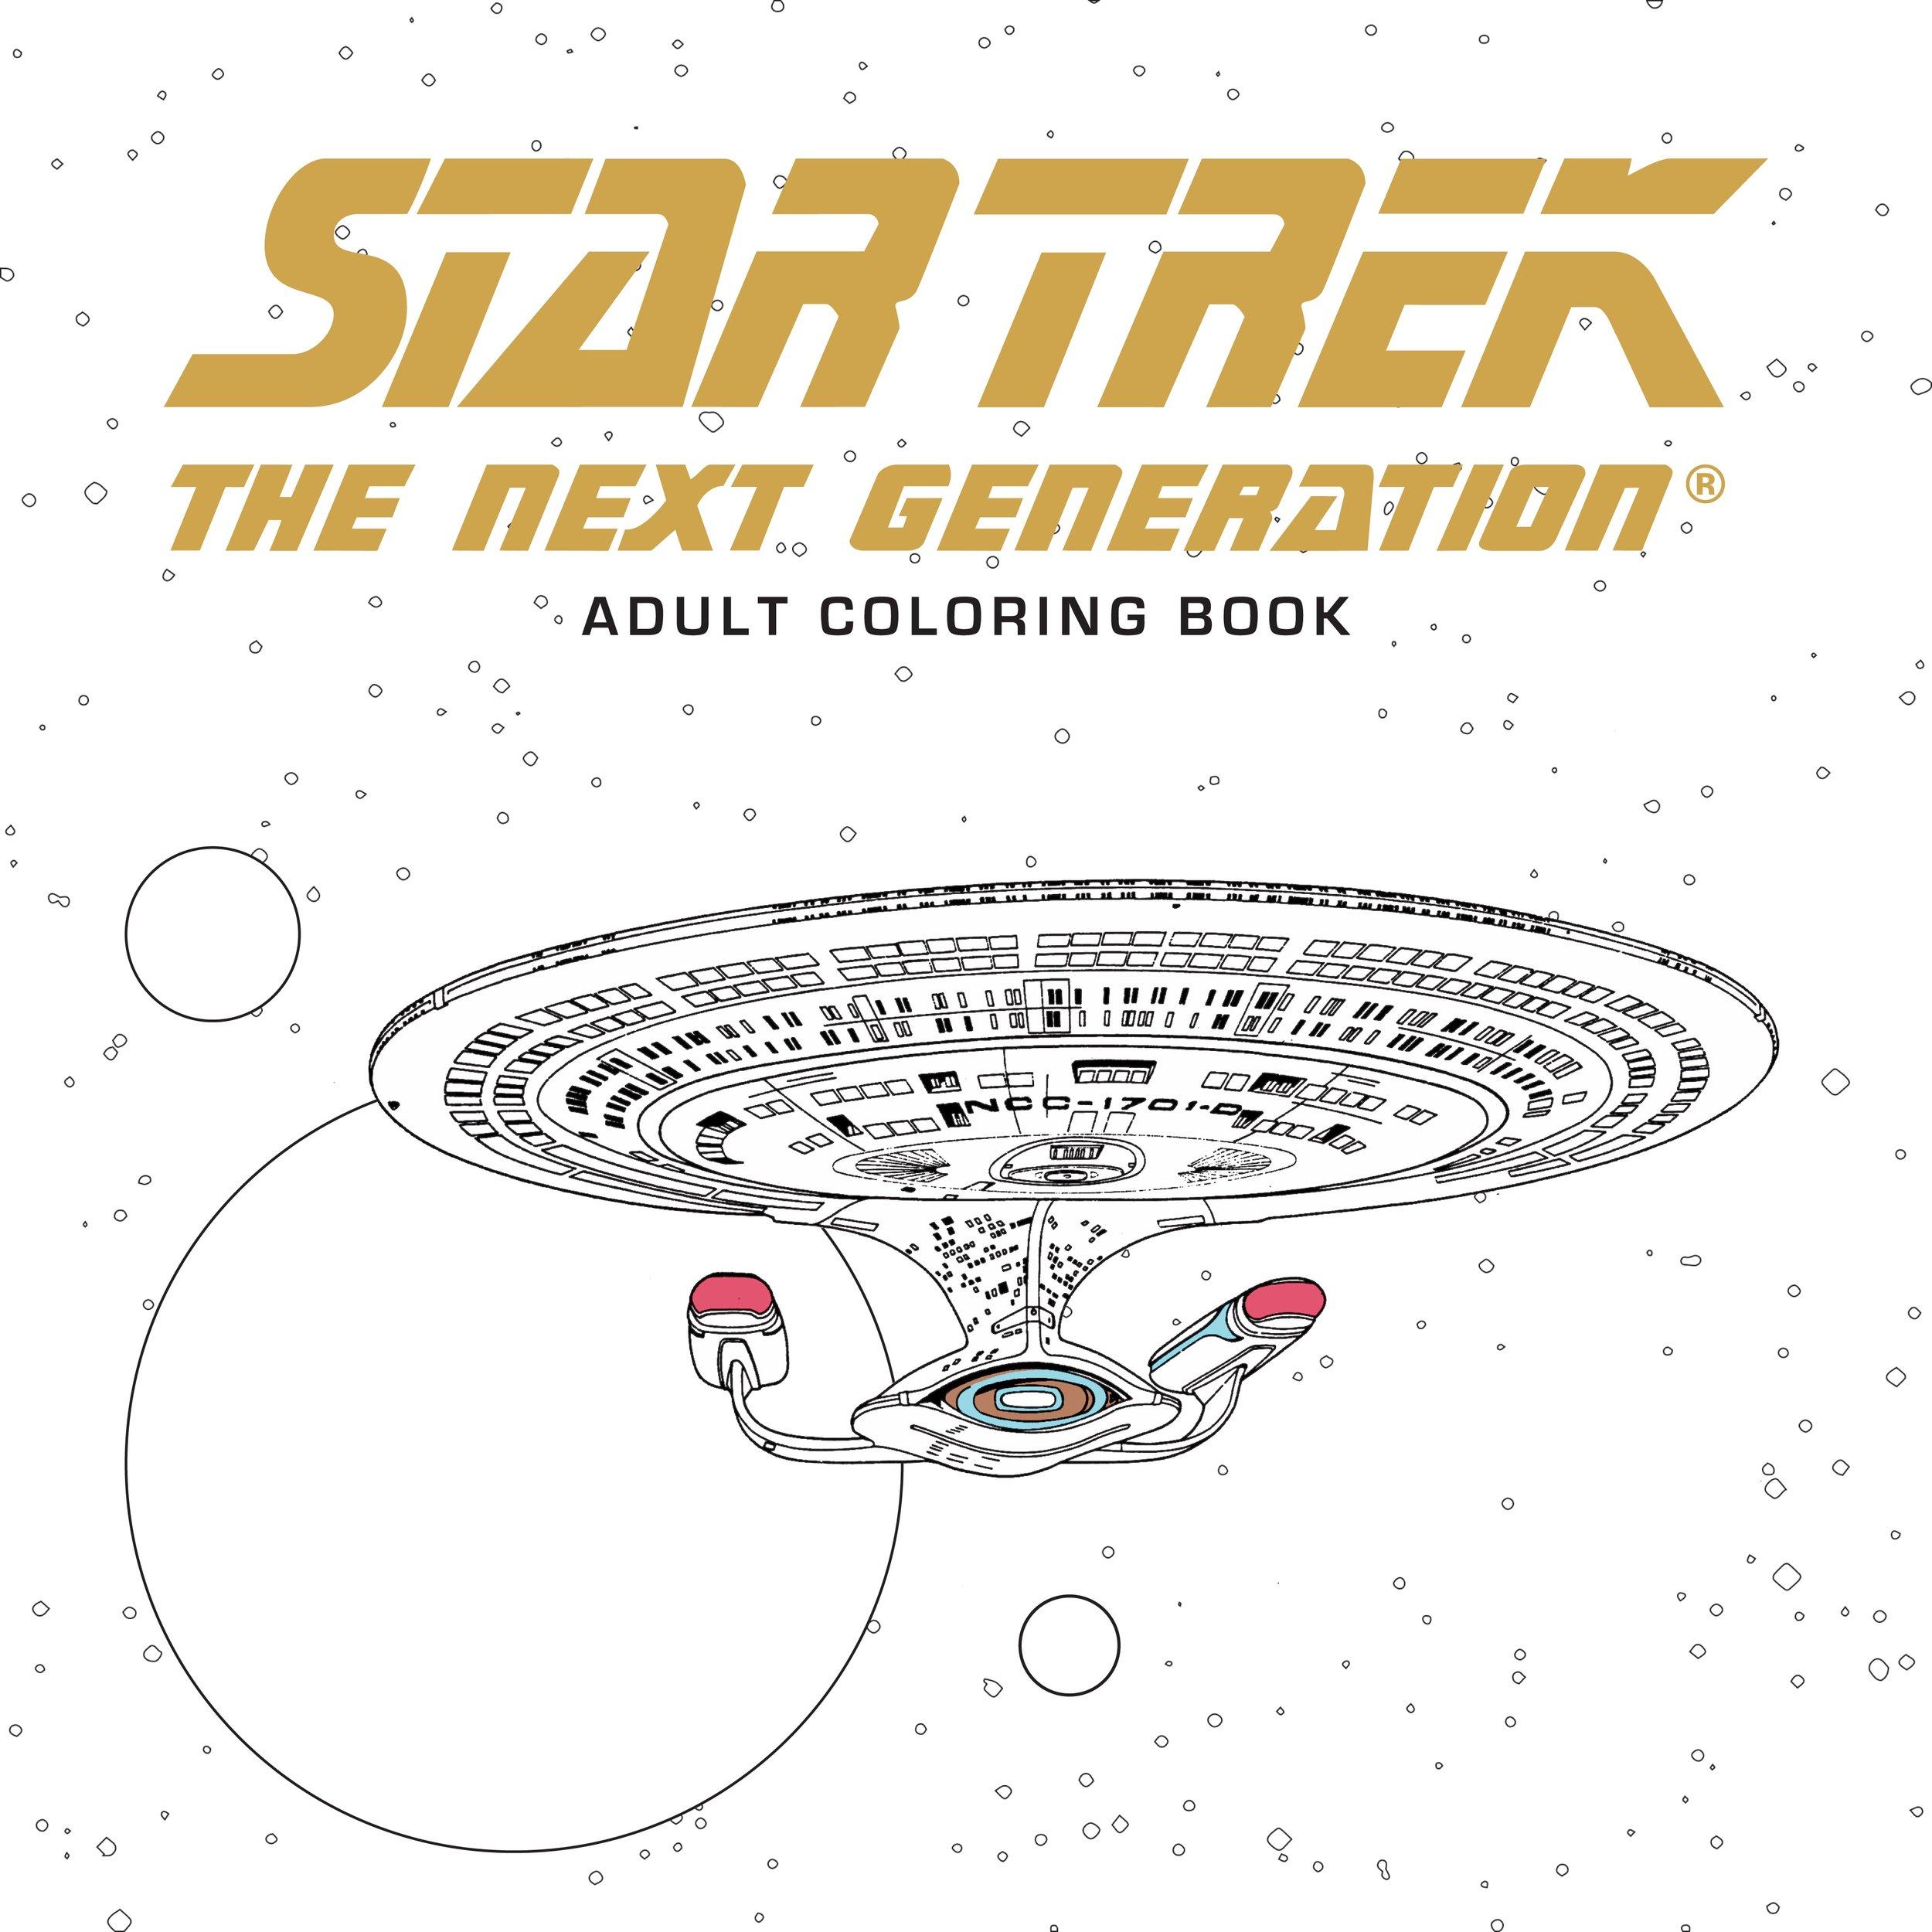 Star Trek NG Coloring.jpg